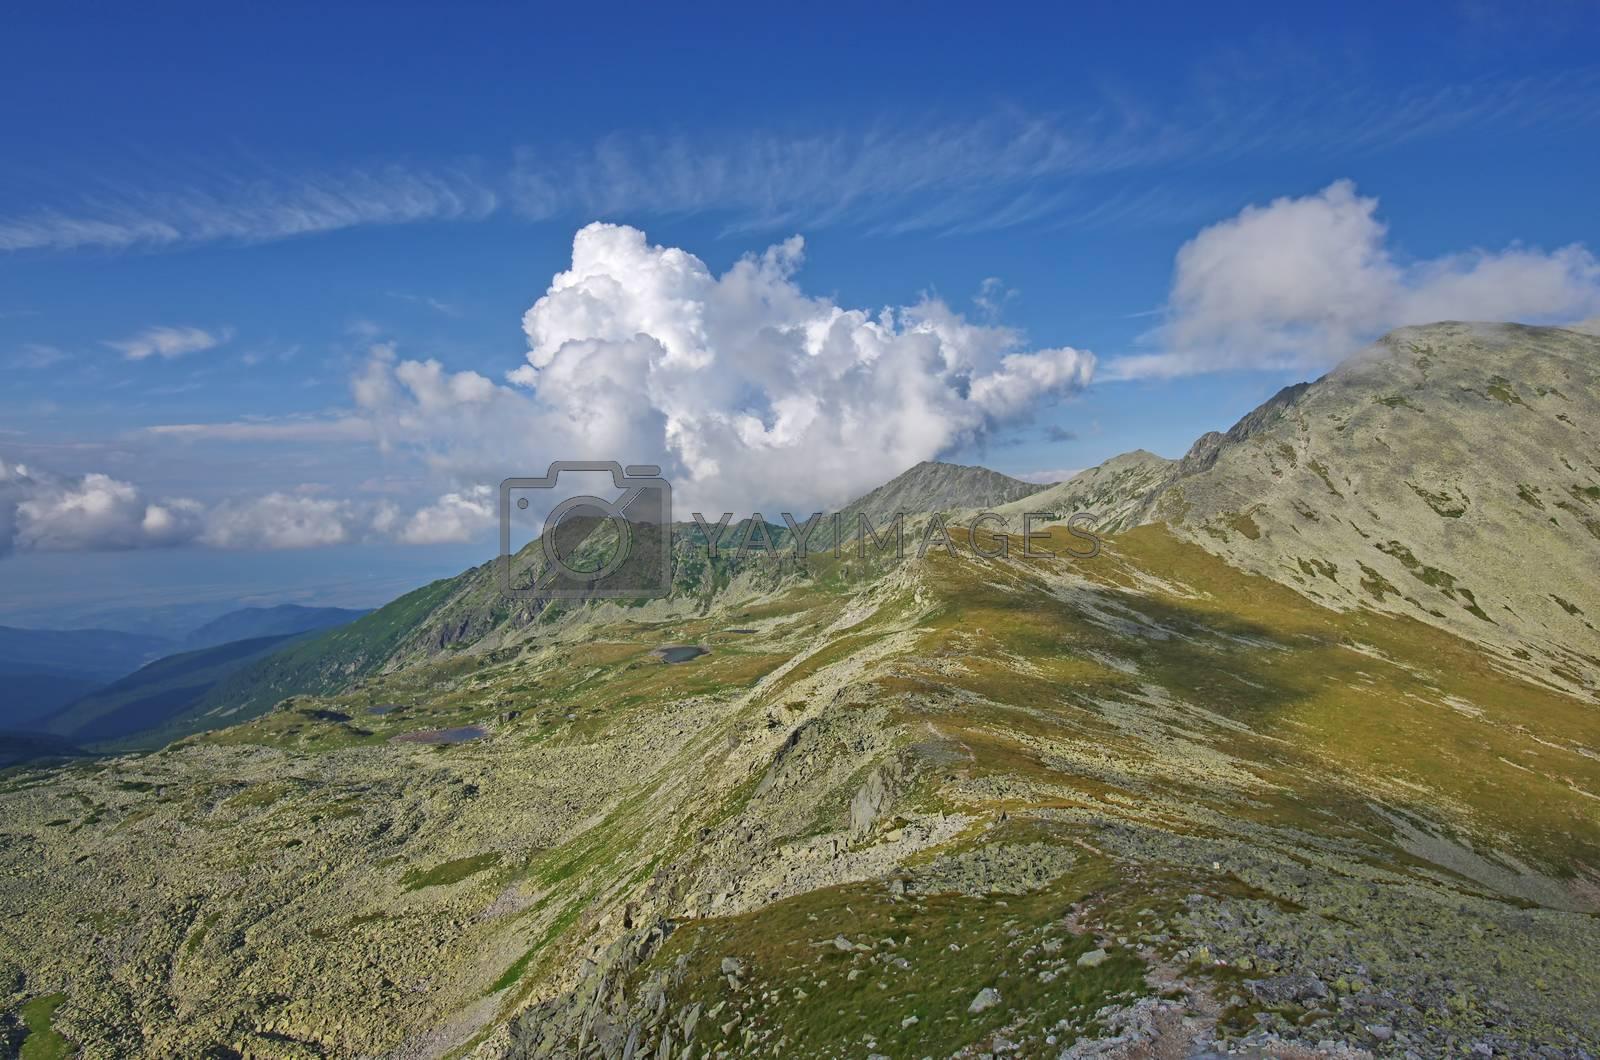 Summer alpine mountain in Romanian Carpathians, Retezat mountain